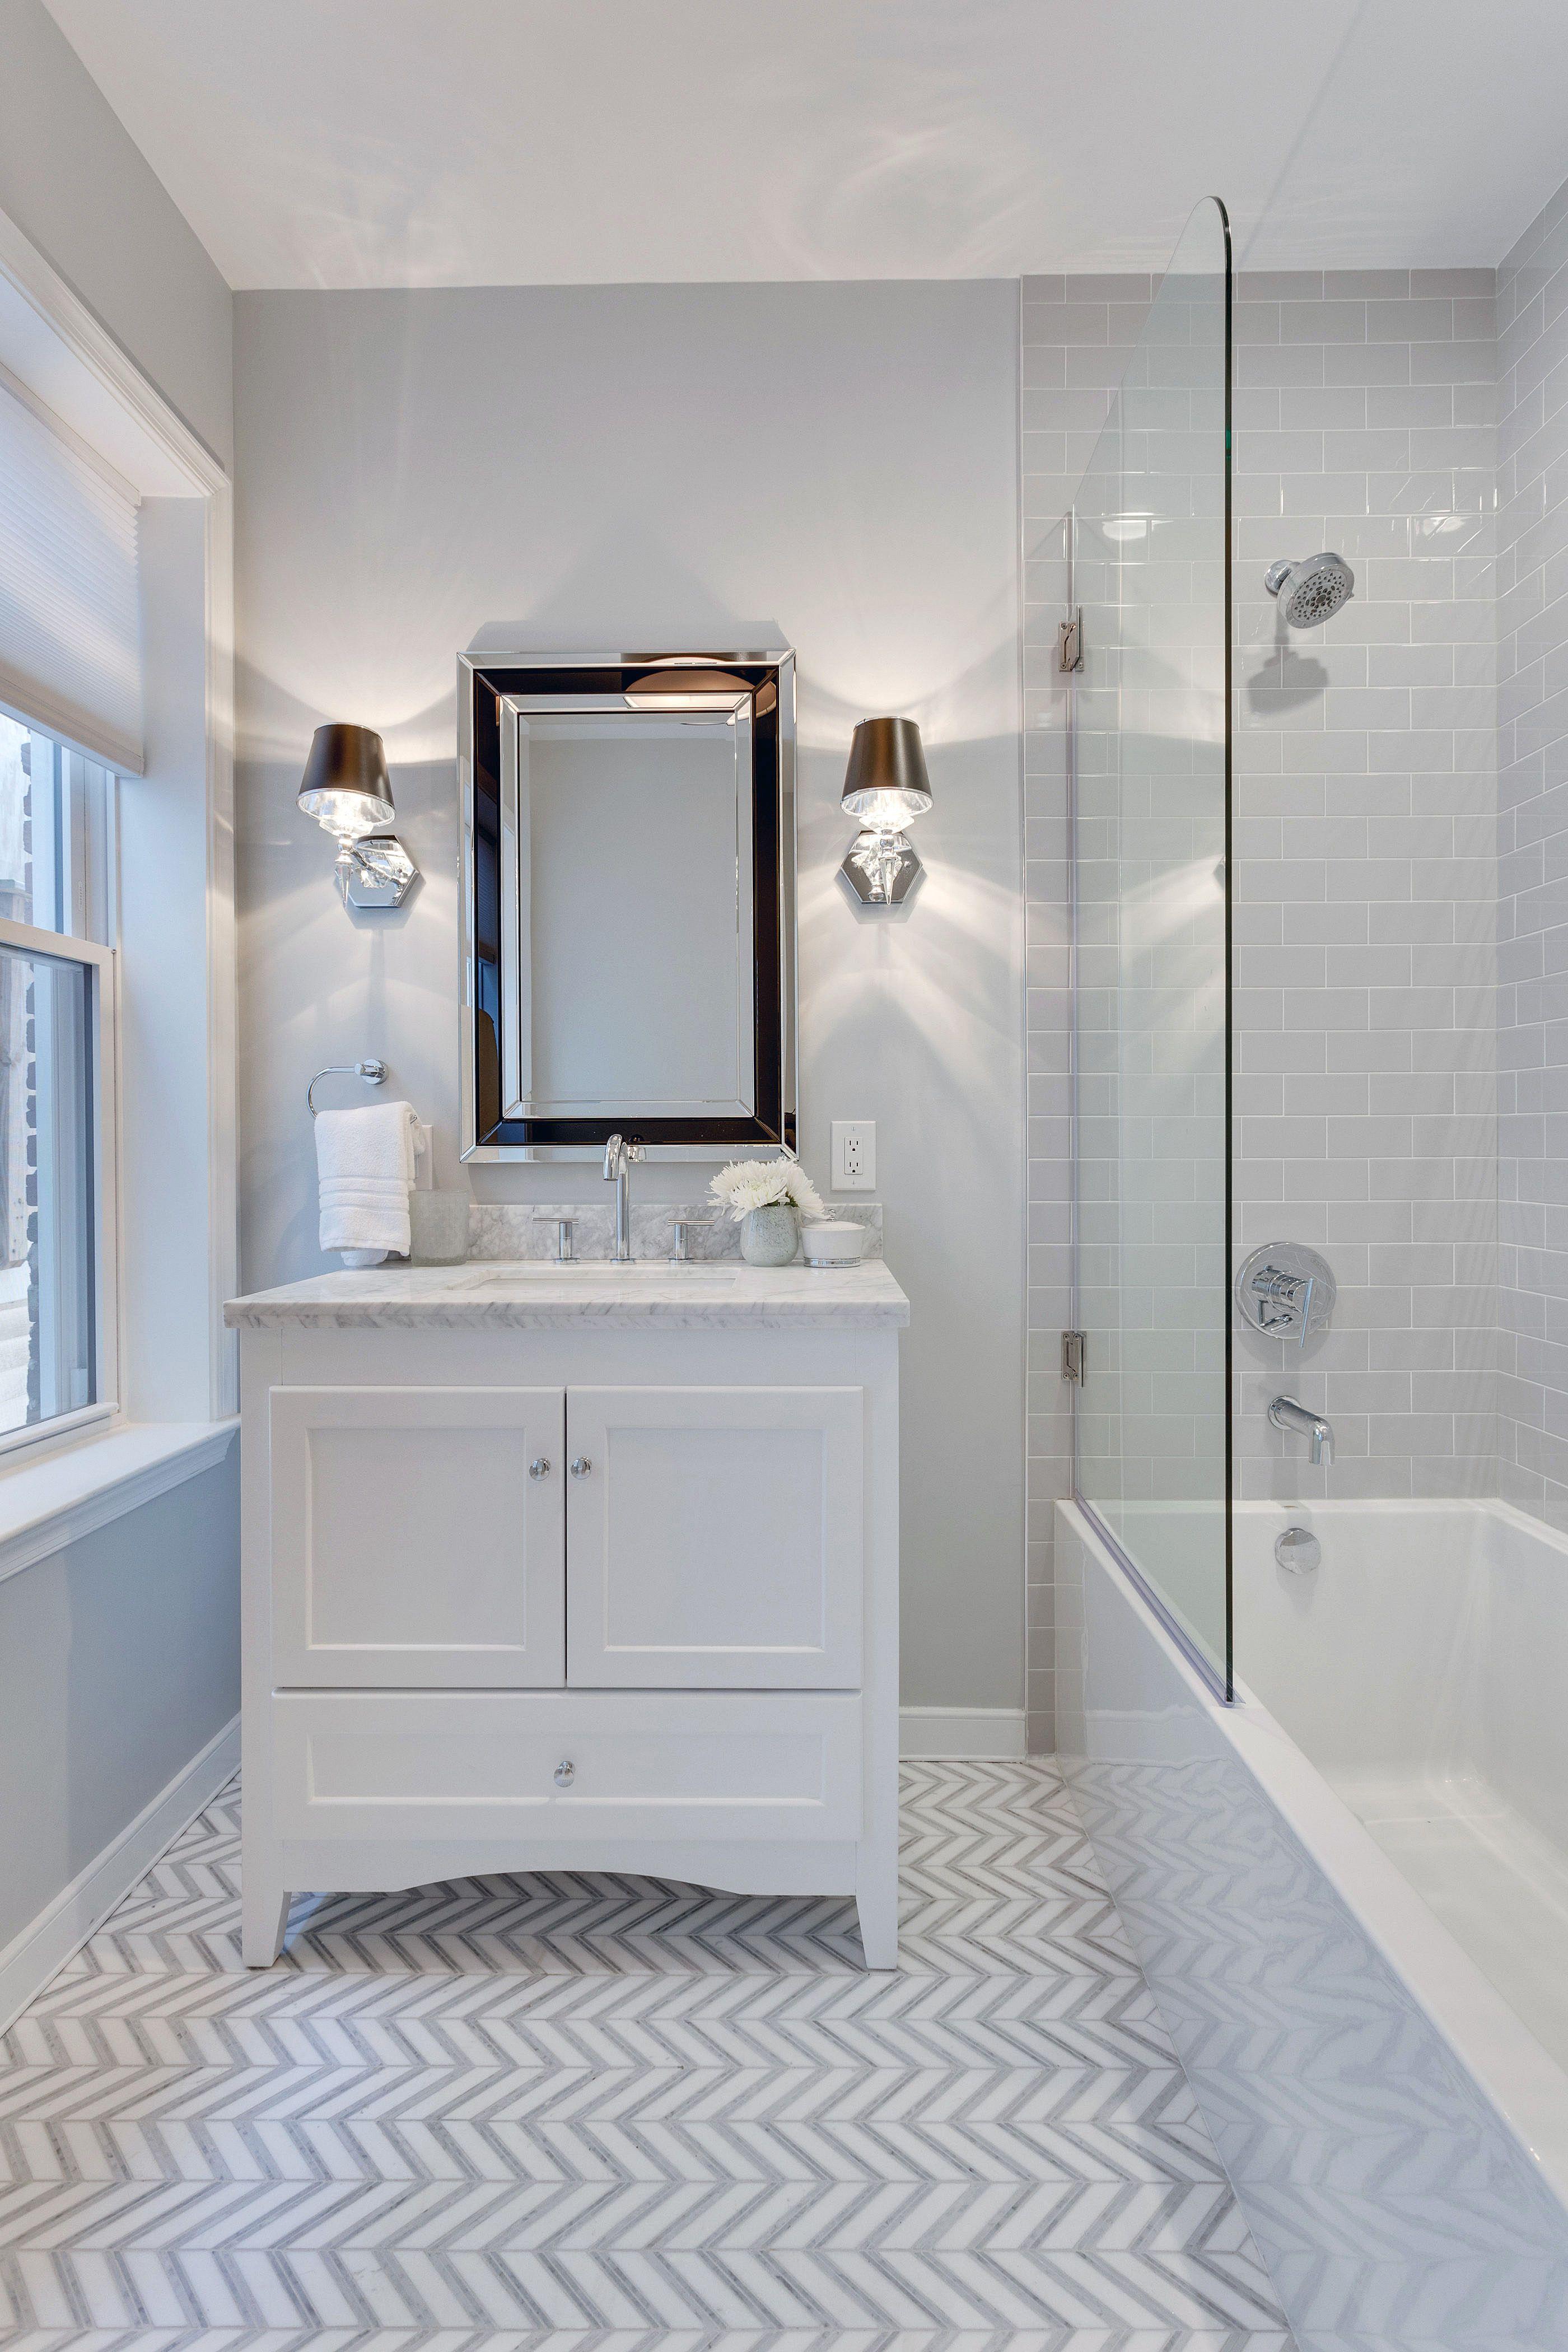 Gray And White Bathroom With Chevron Marble Floor Tile The Ransom Company Stylish Bathroom Bathroom Interior Design Beautiful Bathrooms